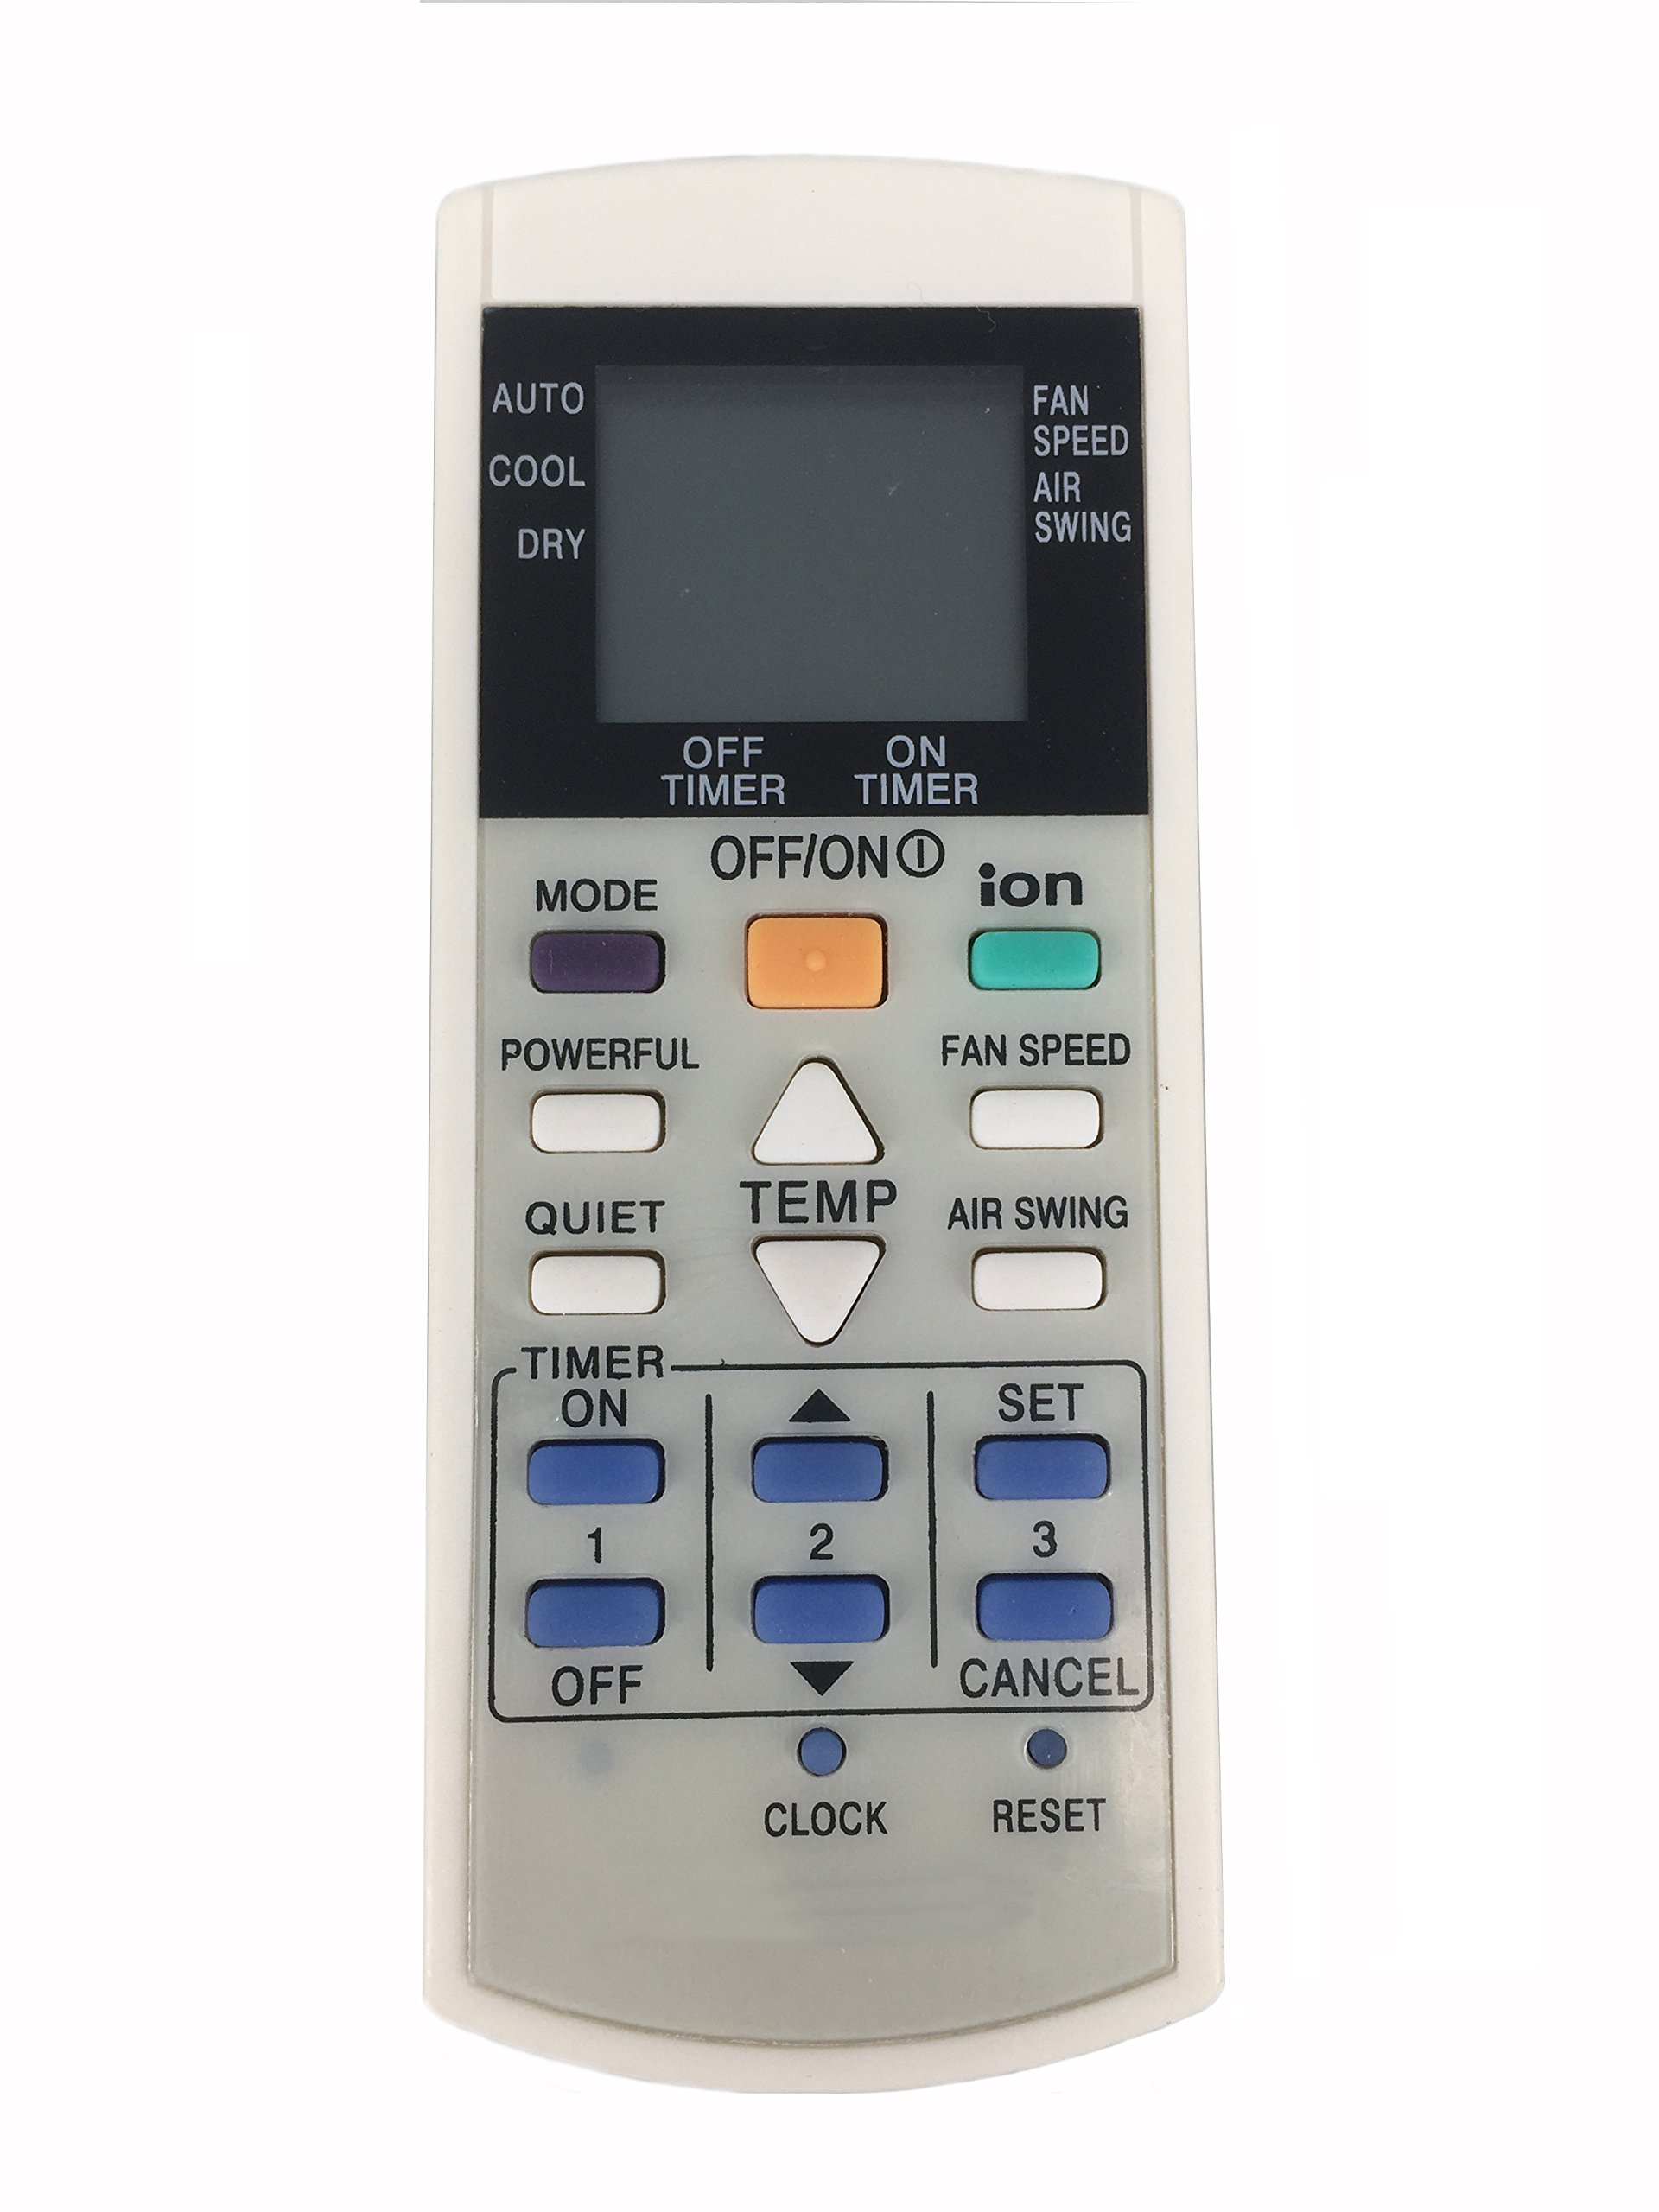 Meide Remote Control for PANASONIC Air Conditioner A75C2600 A75C2602 A75C2606 A75C2628 A75C2632 A75C2656 A75C2658 A75C3299 AT75C3299